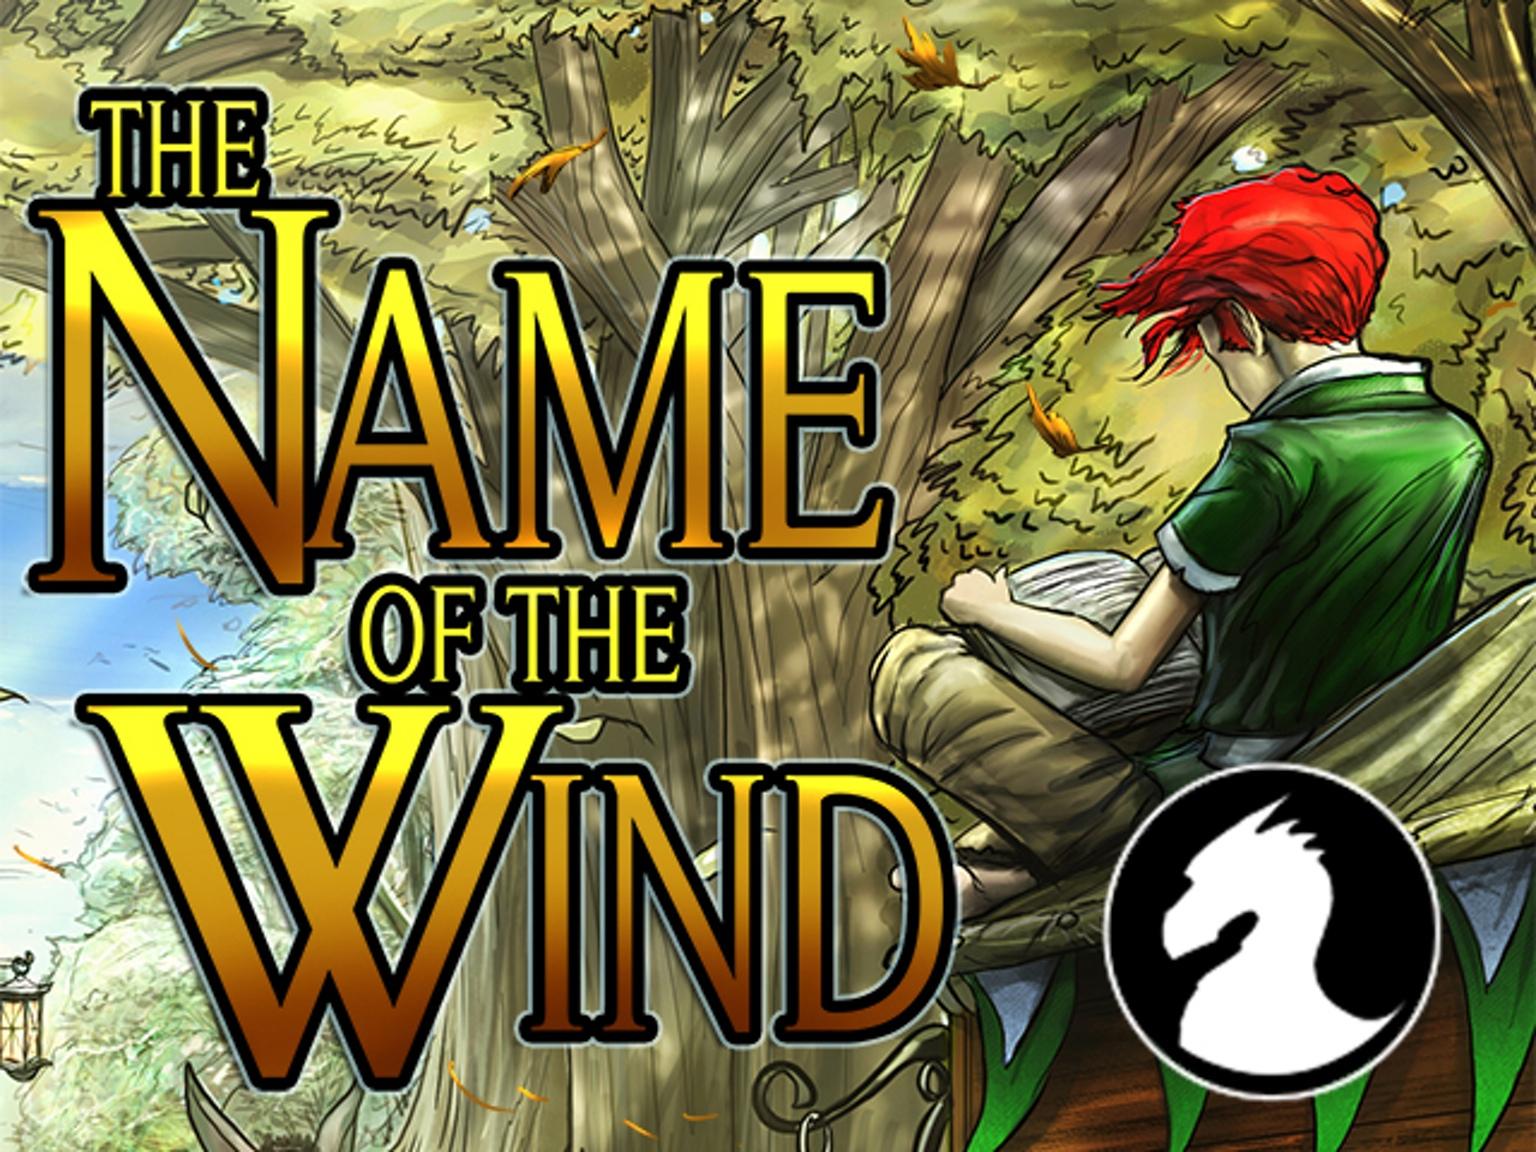 the namo oof wind